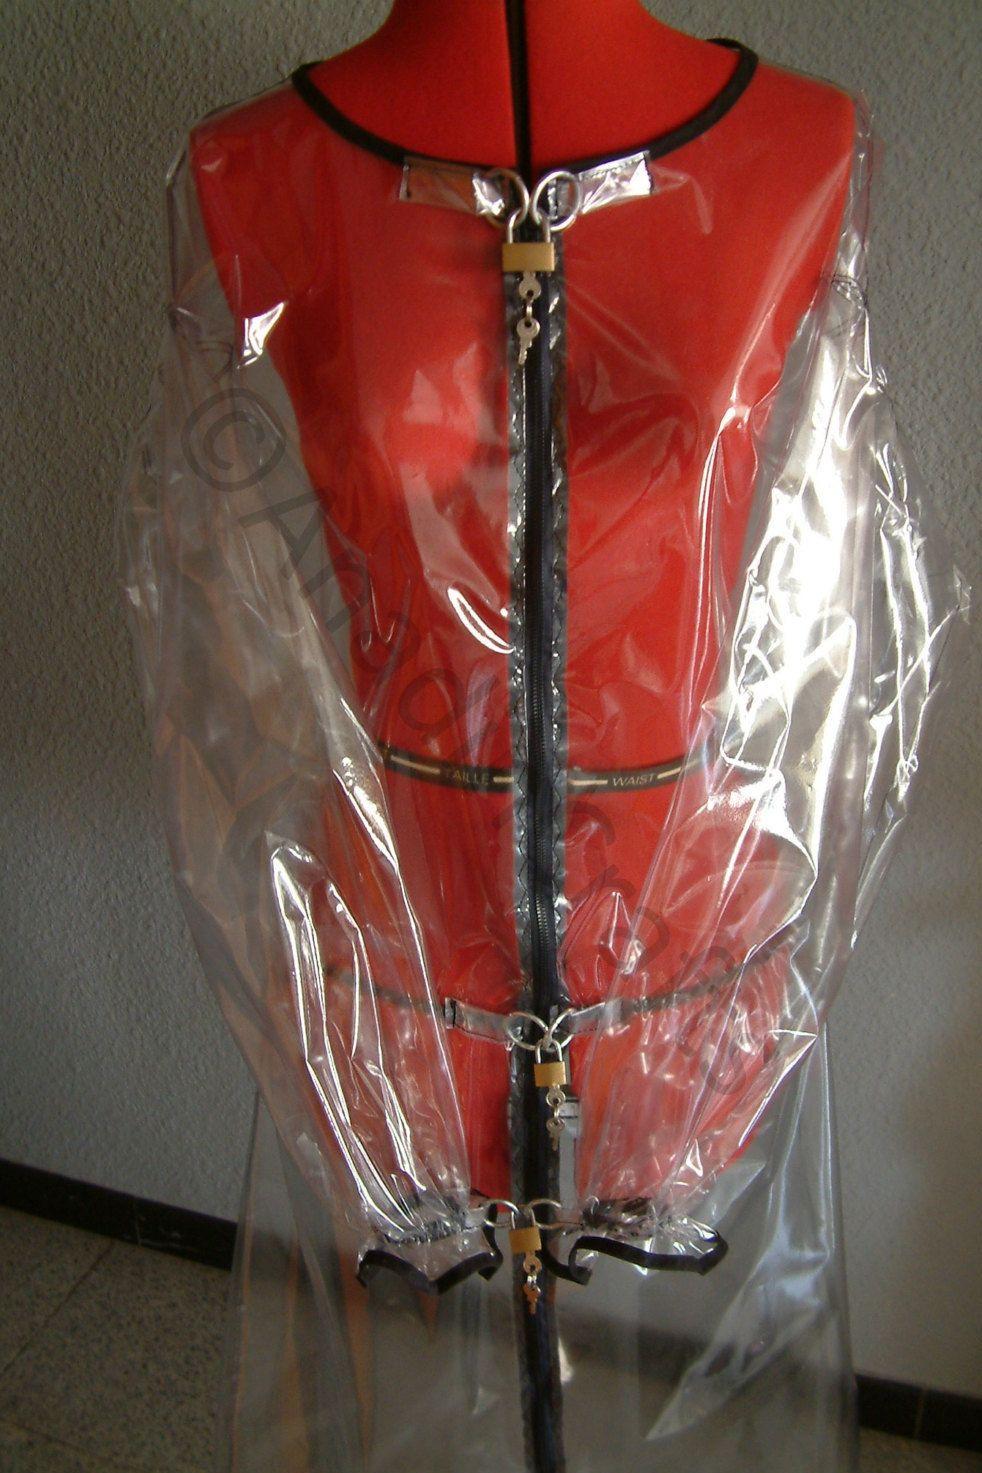 TRANSPARENT Lockable PVC Sissy Dress ***MATURE*** AasTS